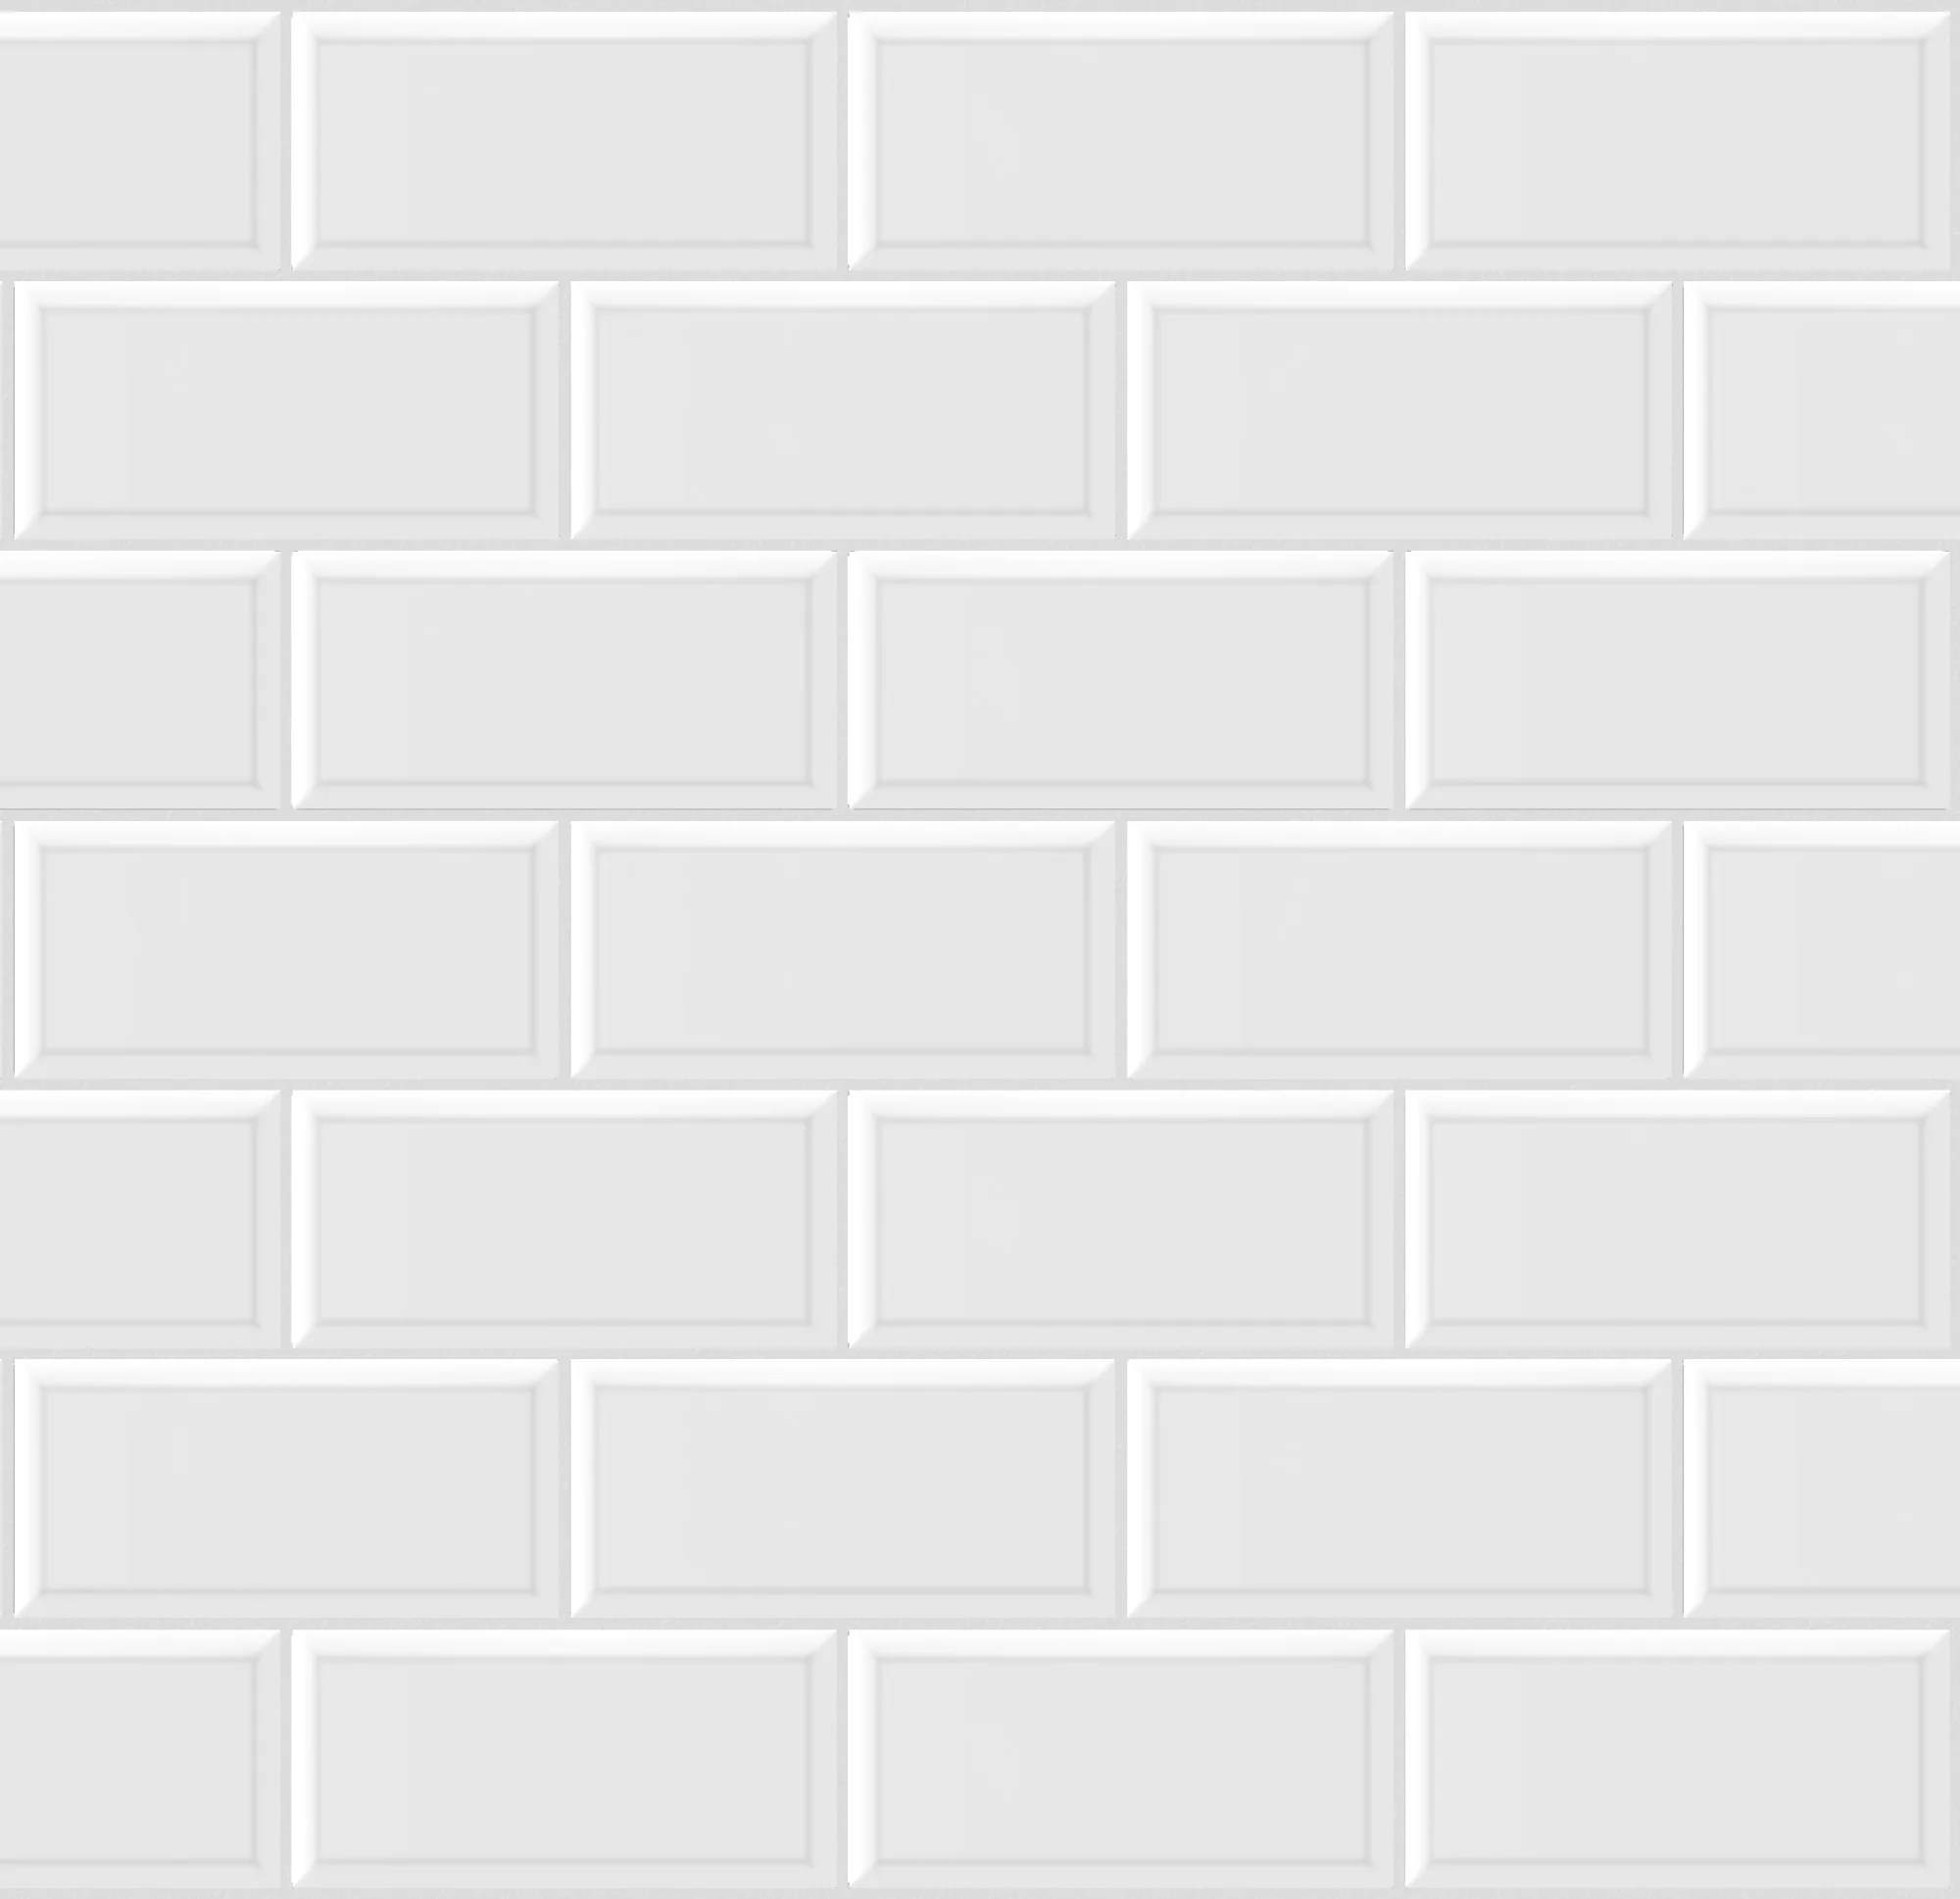 mosaique mur metro blanc 28 8 x 29 25 cm artens